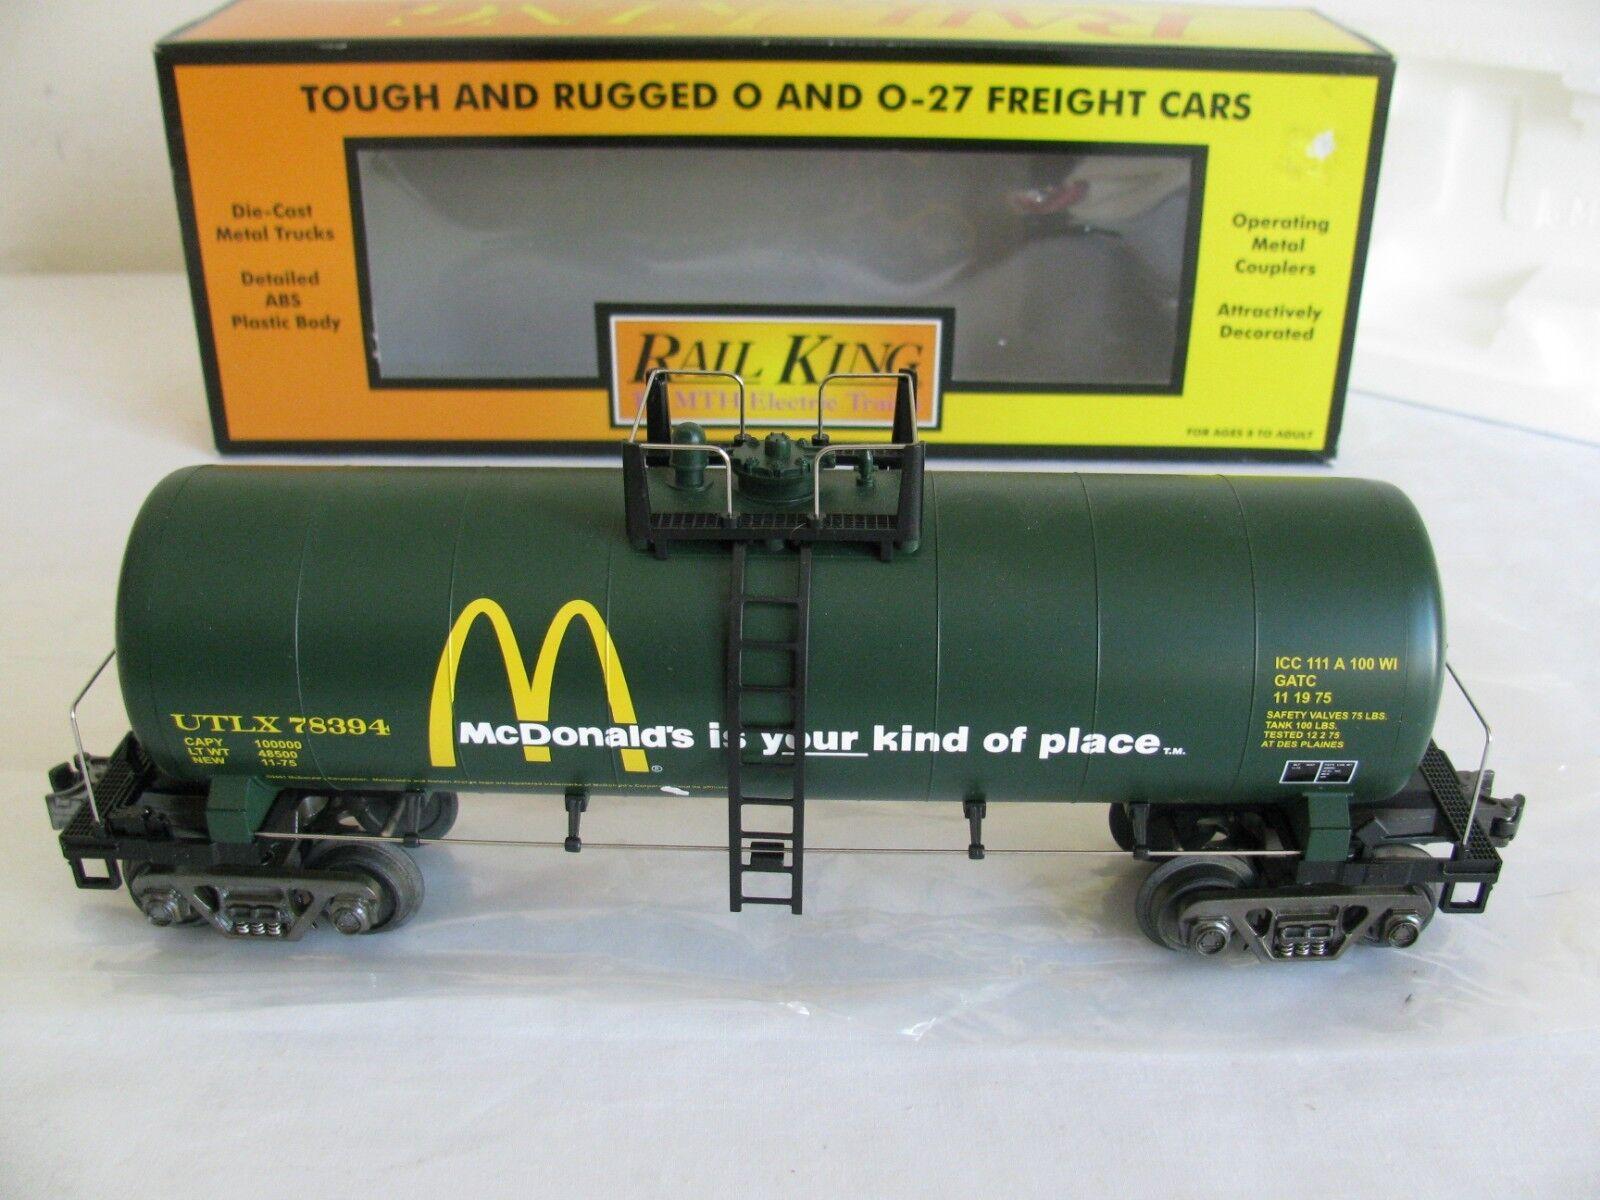 Vintage MTH Rail King O/O-27 Scale McDonald's Modern Tank Car  30-7336 EX